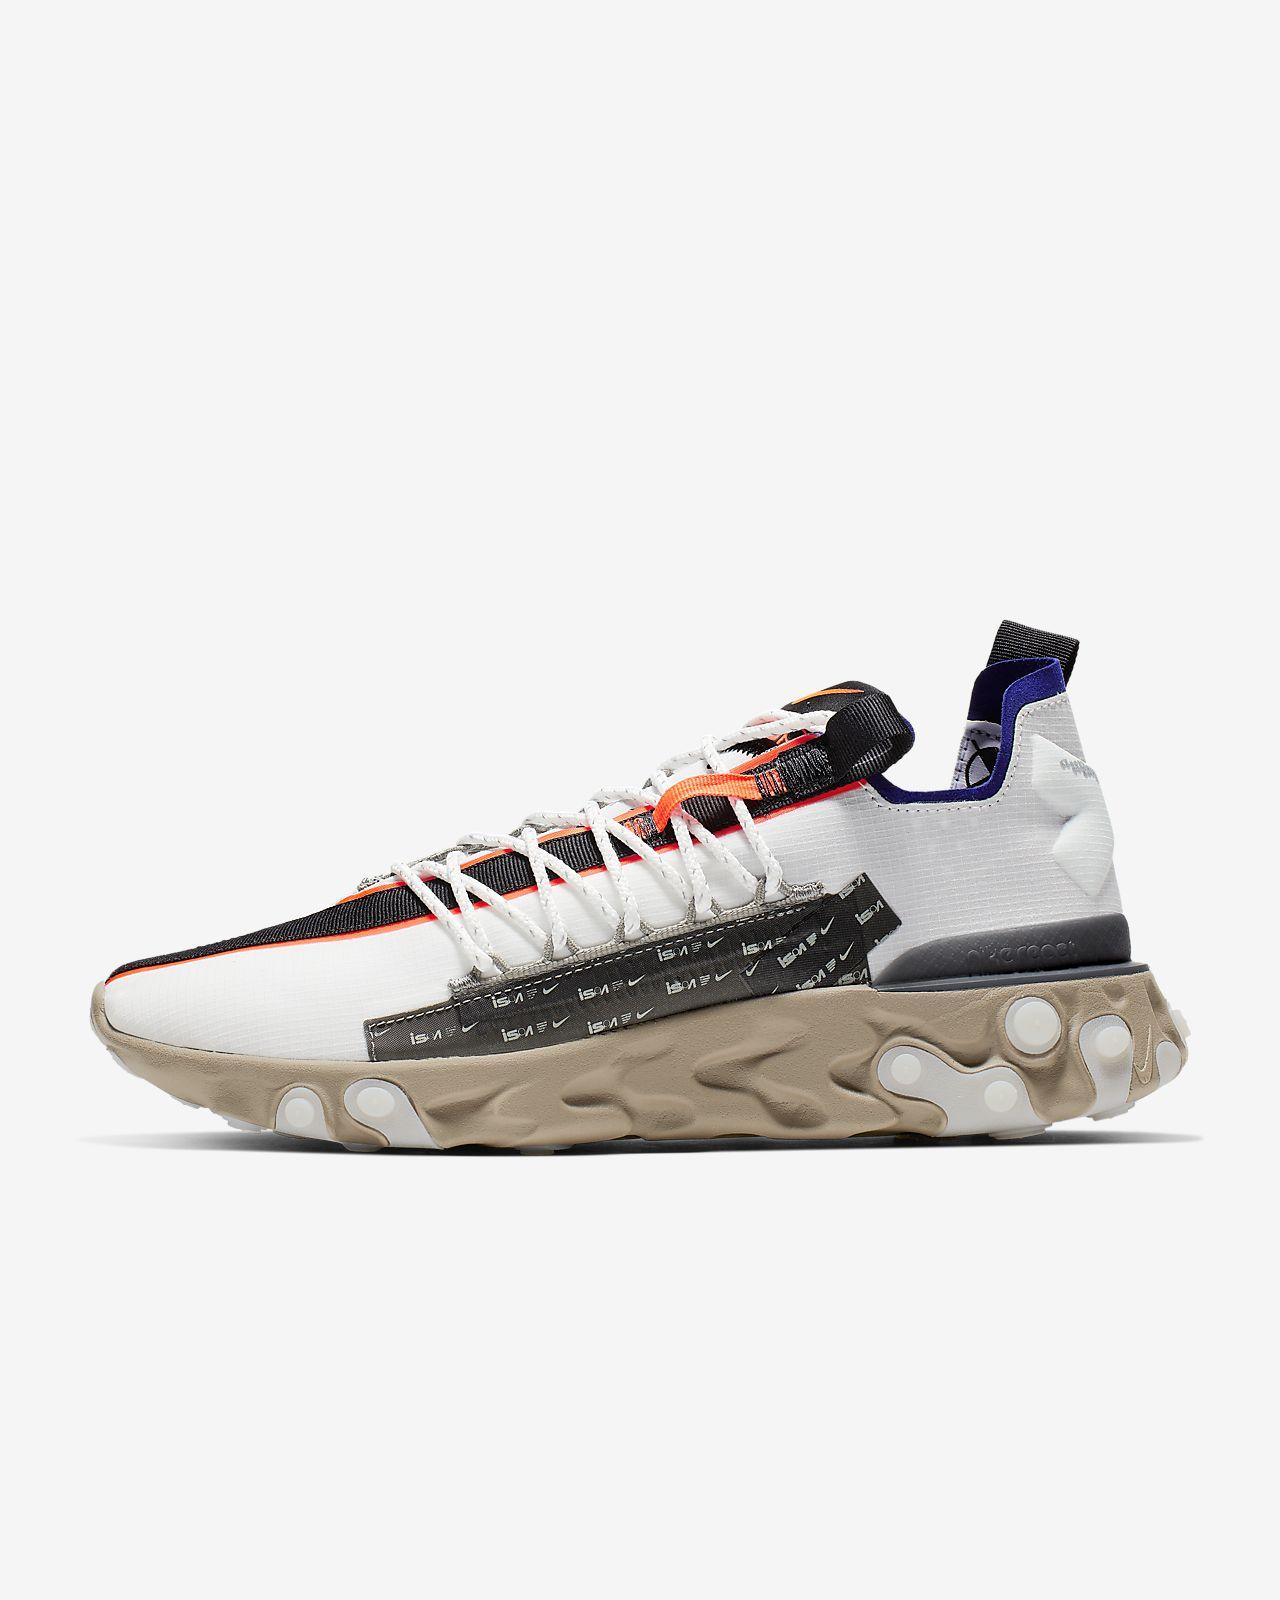 Nike ISPA React WR Men's Shoe